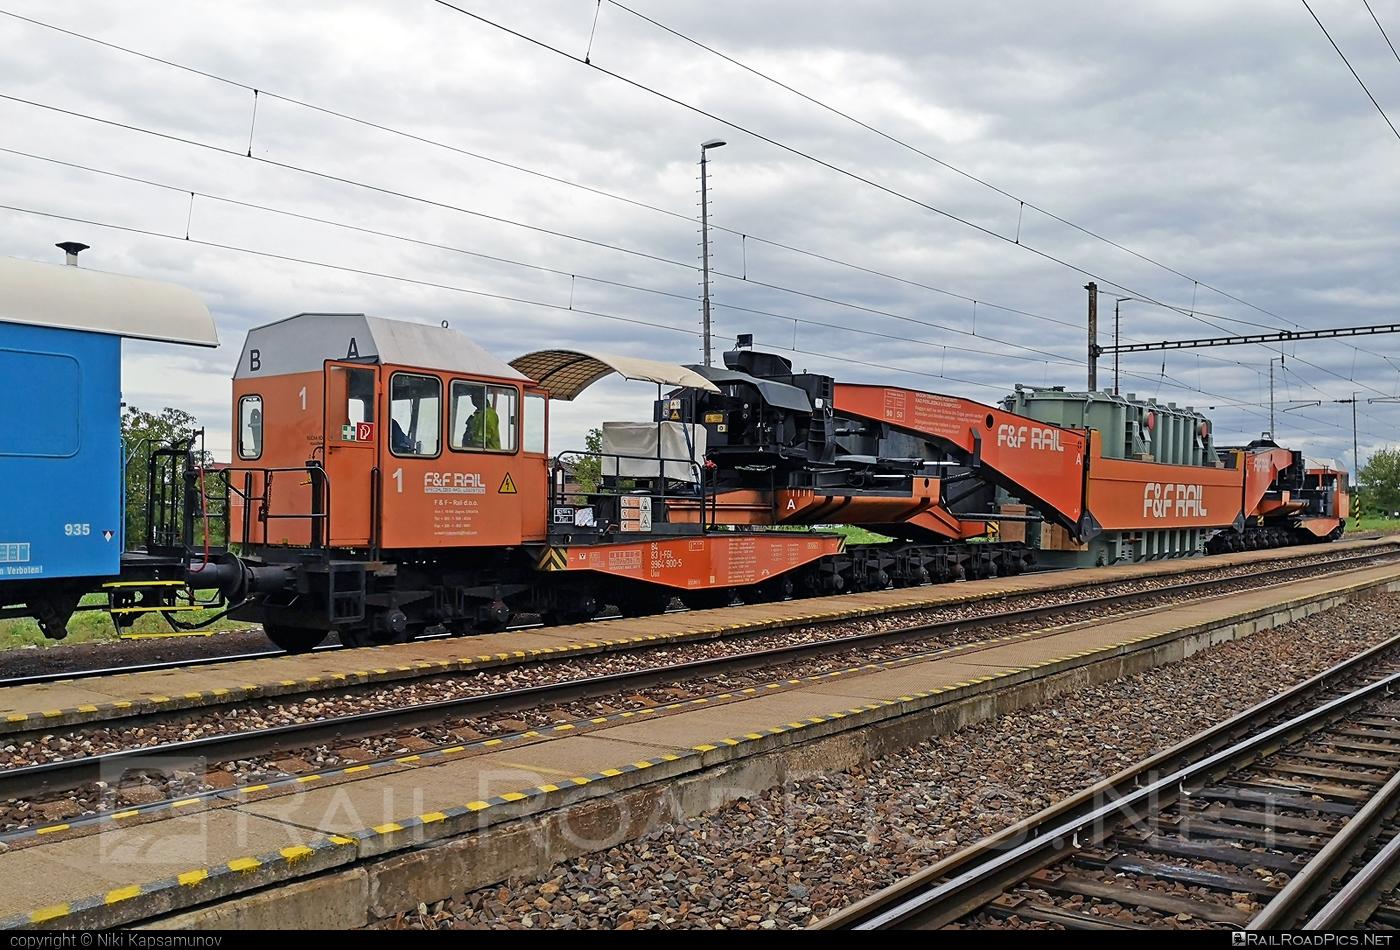 Class U - Uaai - 84 83 9964 900-5 I-FGL operated by F&F Rail d.o.o. #FFrail #FFrailDoo #uaai